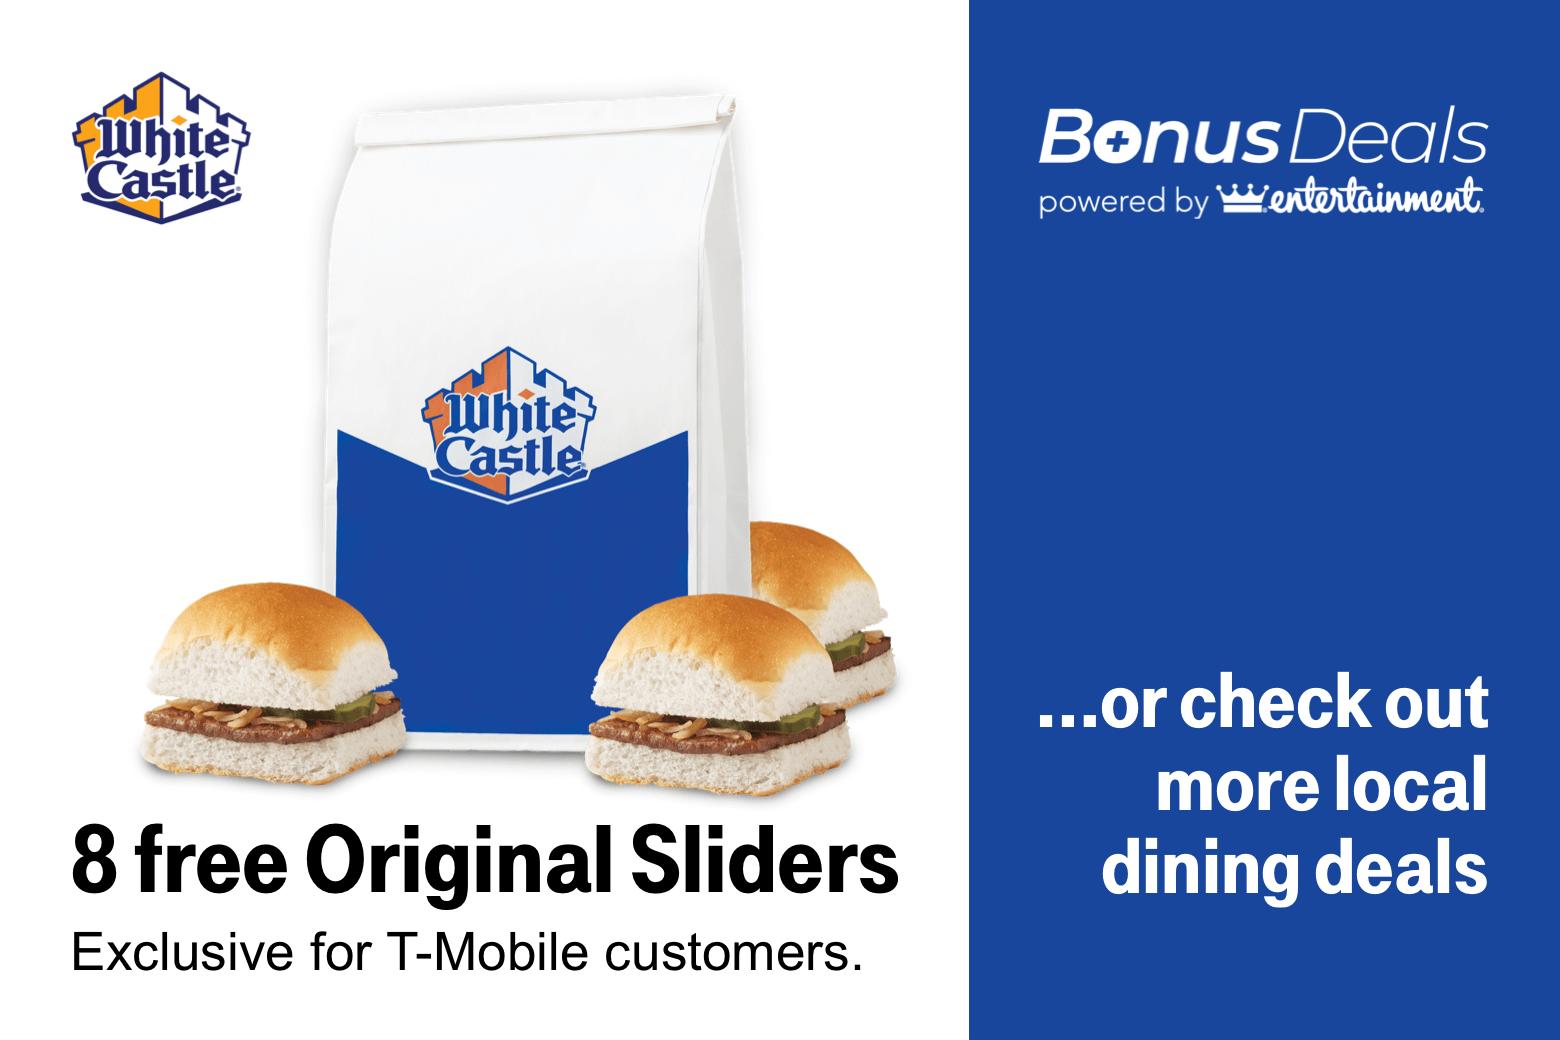 T-Mobile Customers 05/28: 8 Free Sliders White Castle, Free Redbox Rental